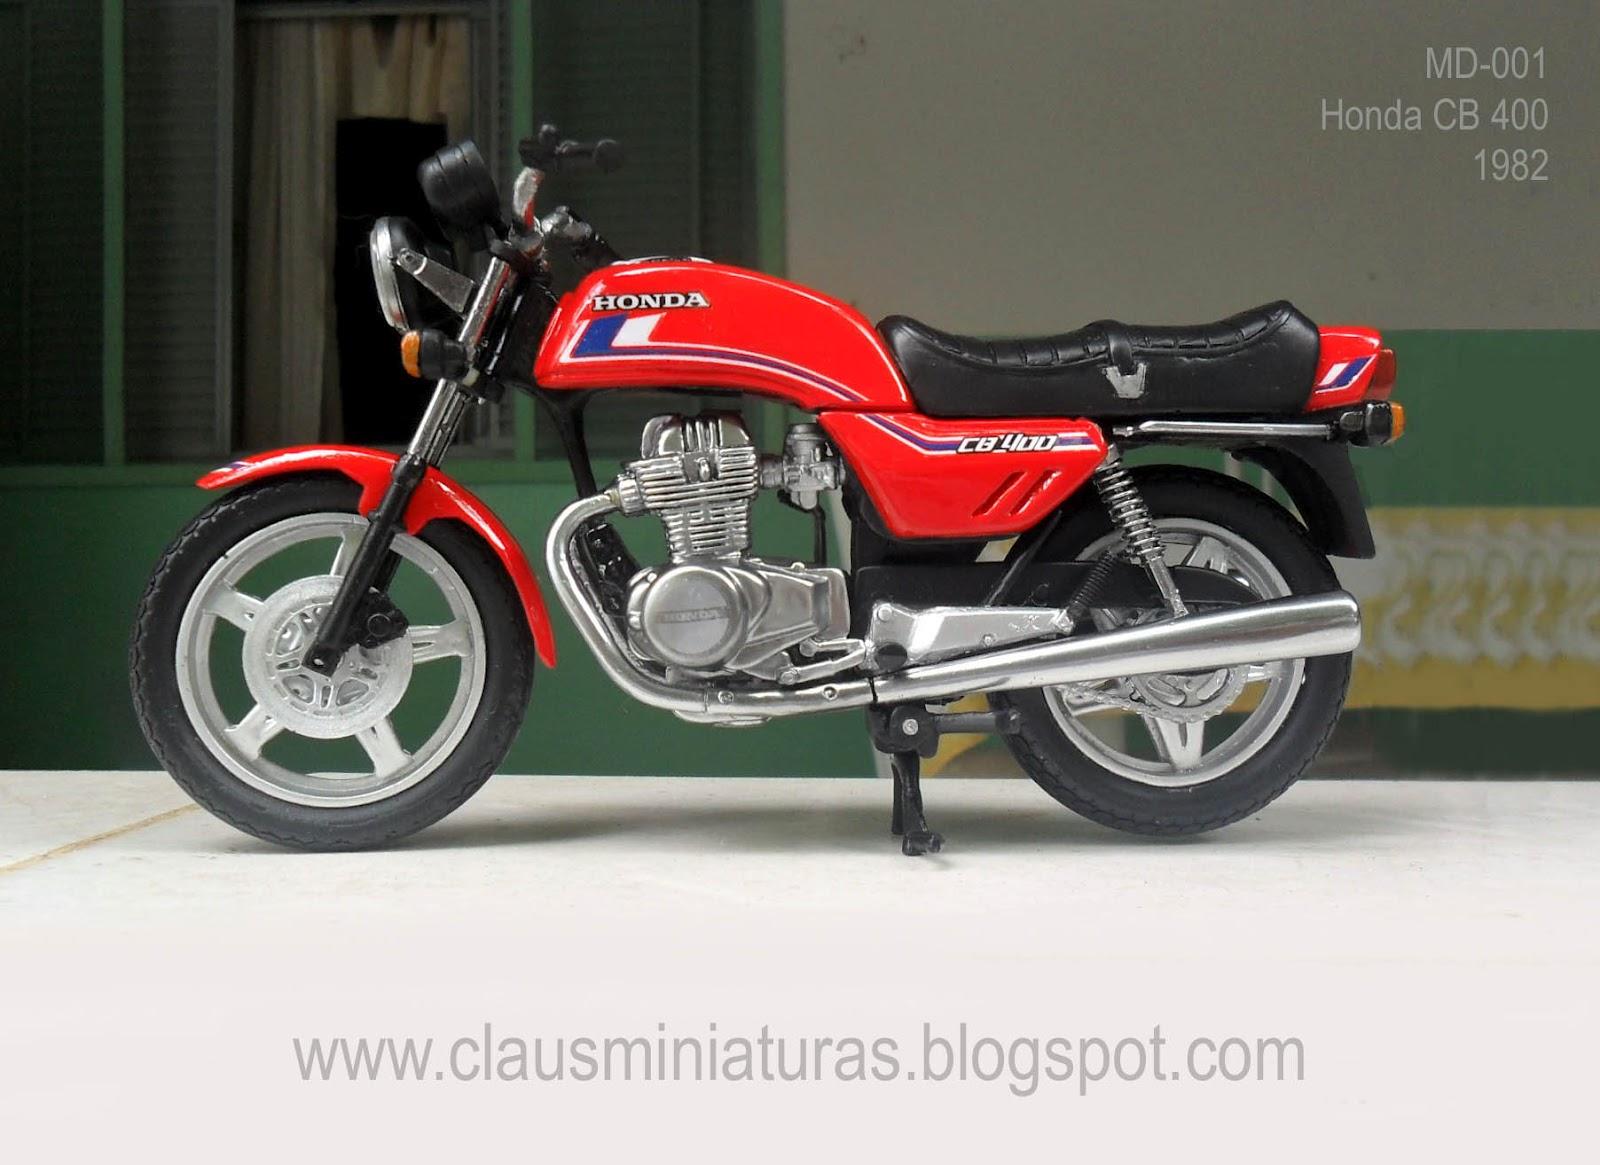 Honda CB 400 super four 2002 каталог #10